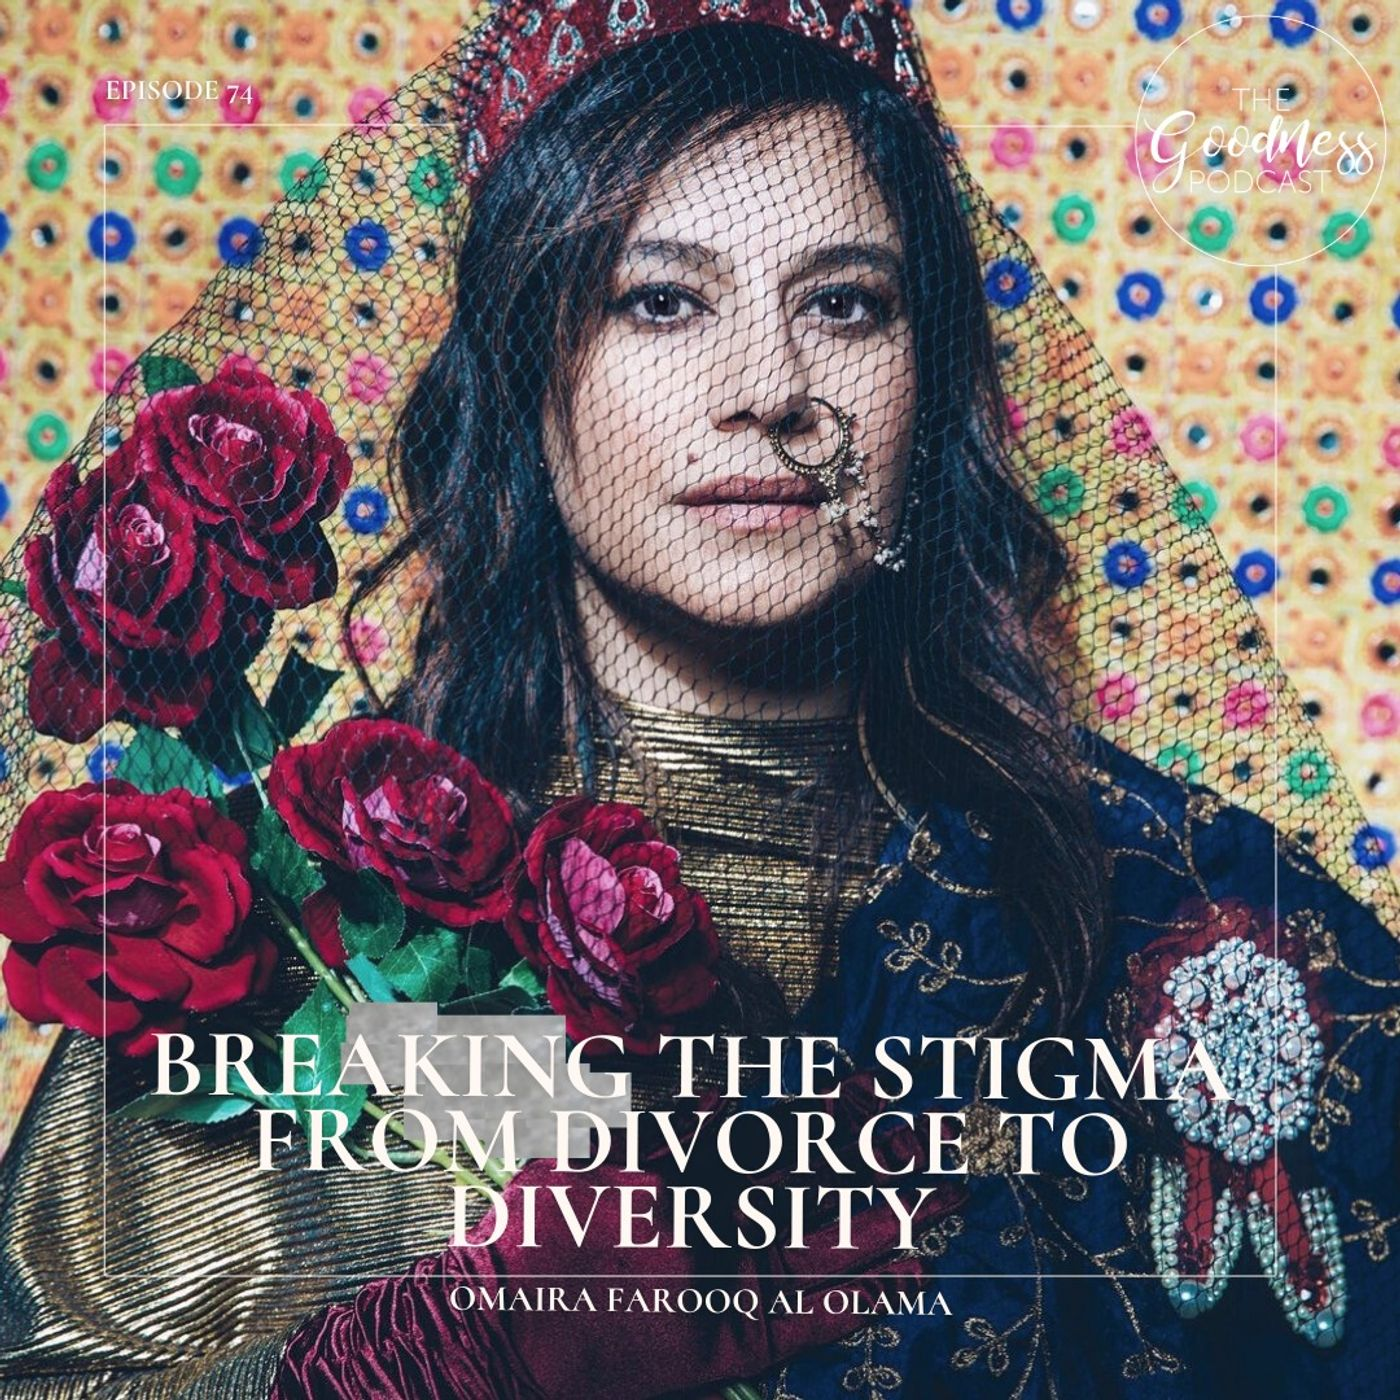 Omaira Farooq Al Olama: Breaking the Stigma – From Divorce to Diversity